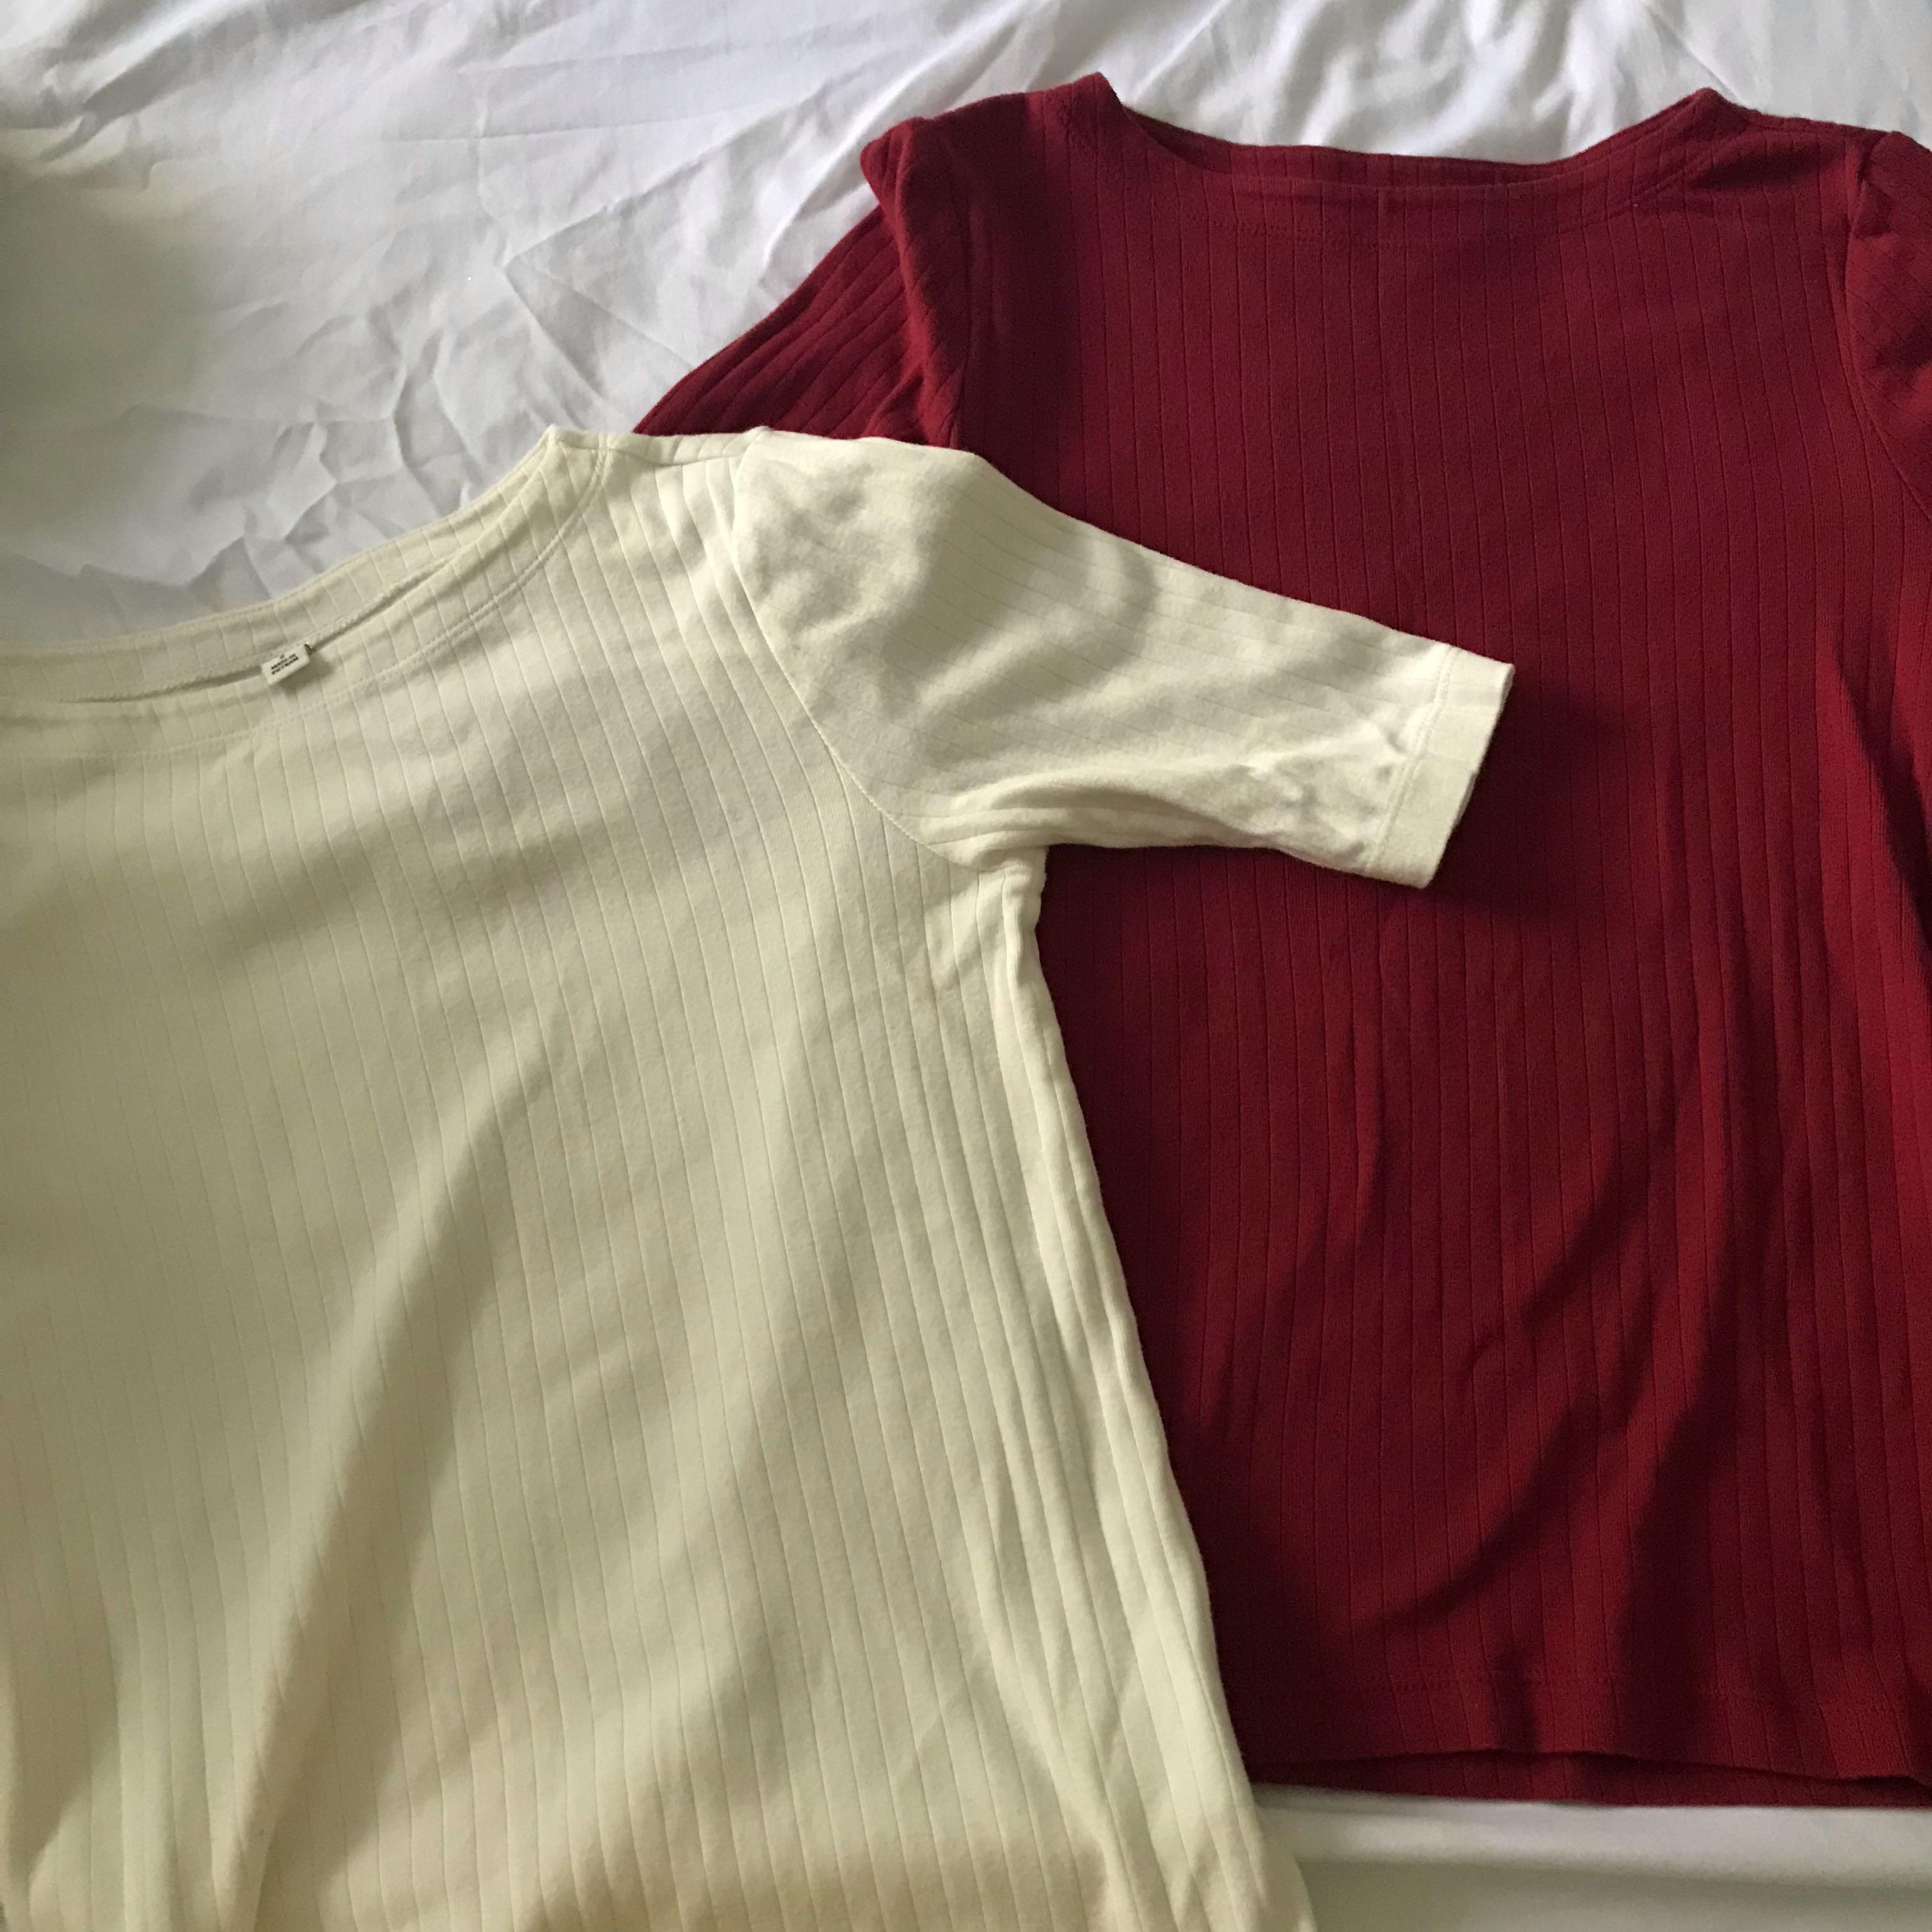 da500c58bcbae3 Uniqlo Half Sleeves Top (Pink/White), Women's Fashion, Clothes, Tops ...